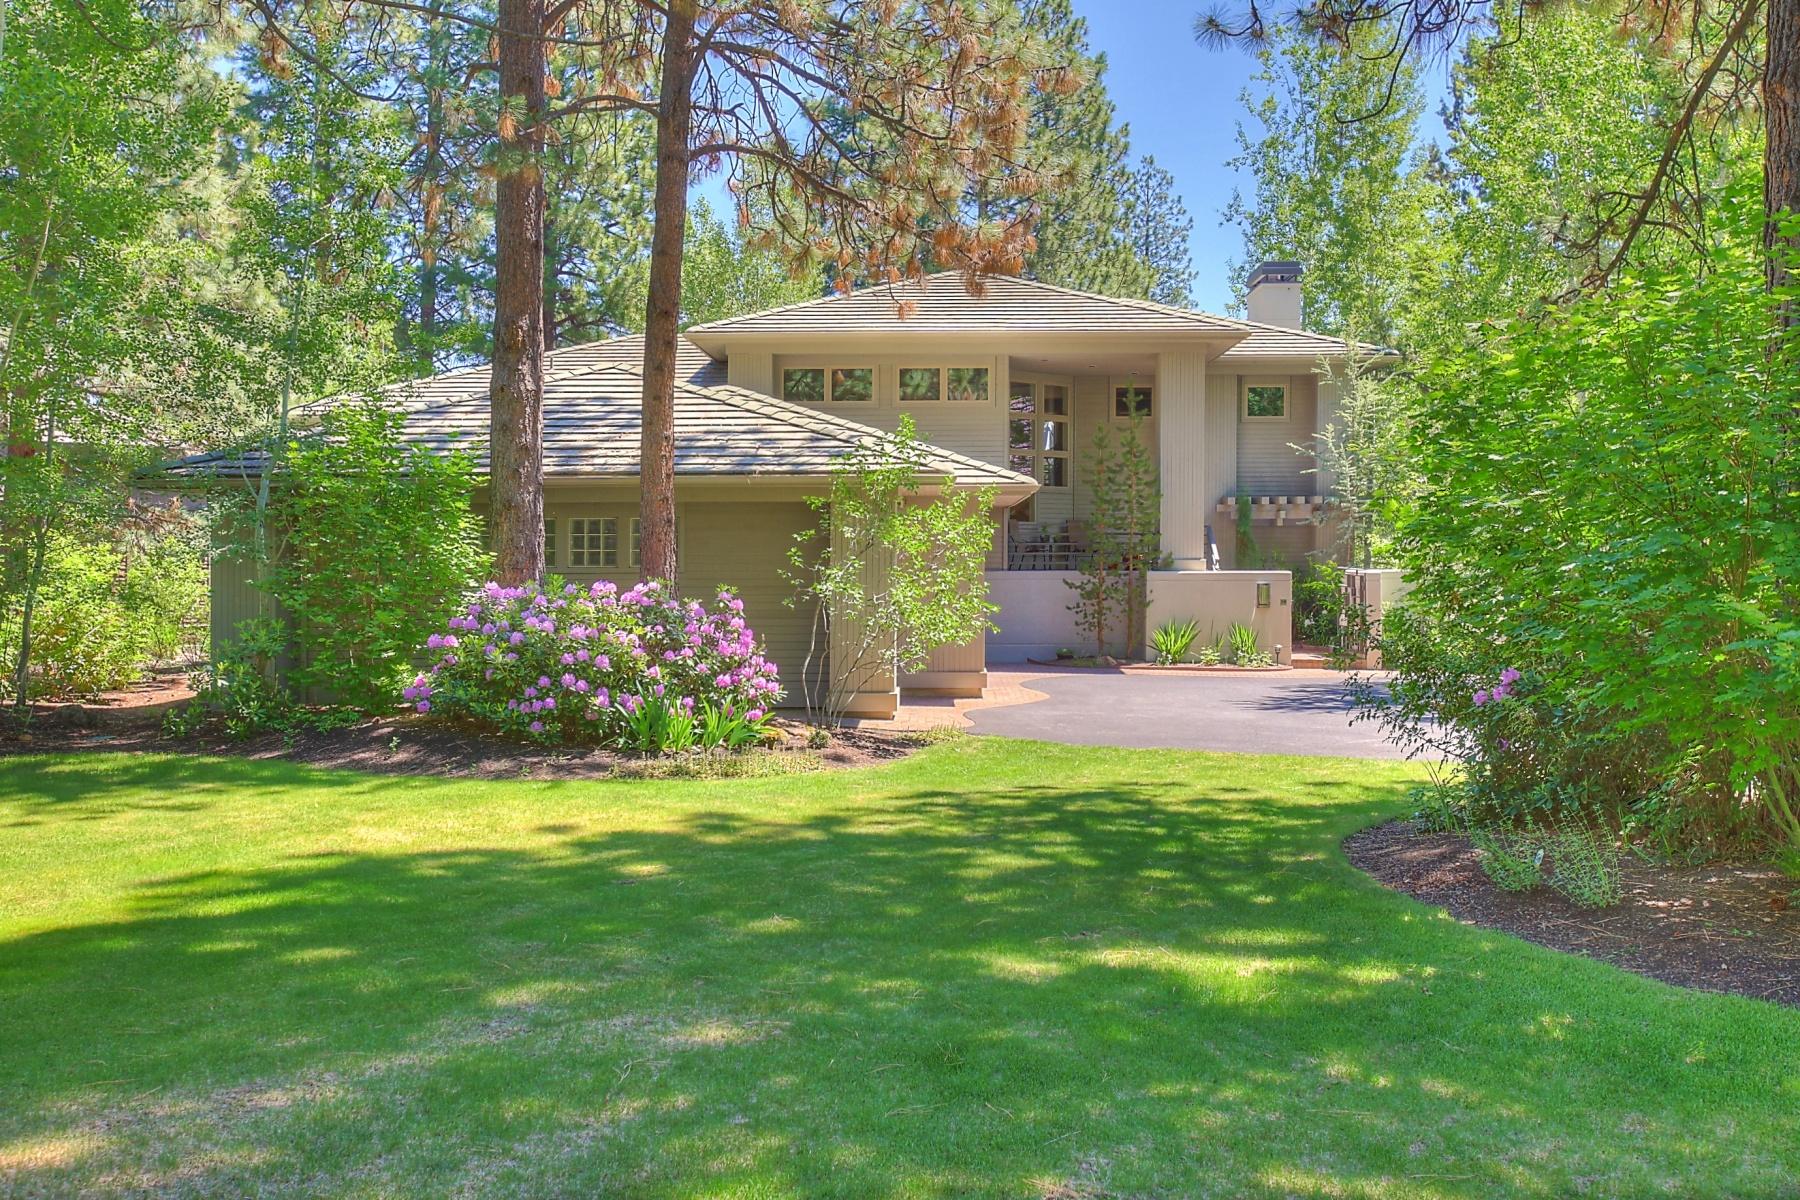 Casa para uma família para Venda às Broken Top 61715 Tam McArthur Loop Bend, Oregon 97702 Estados Unidos